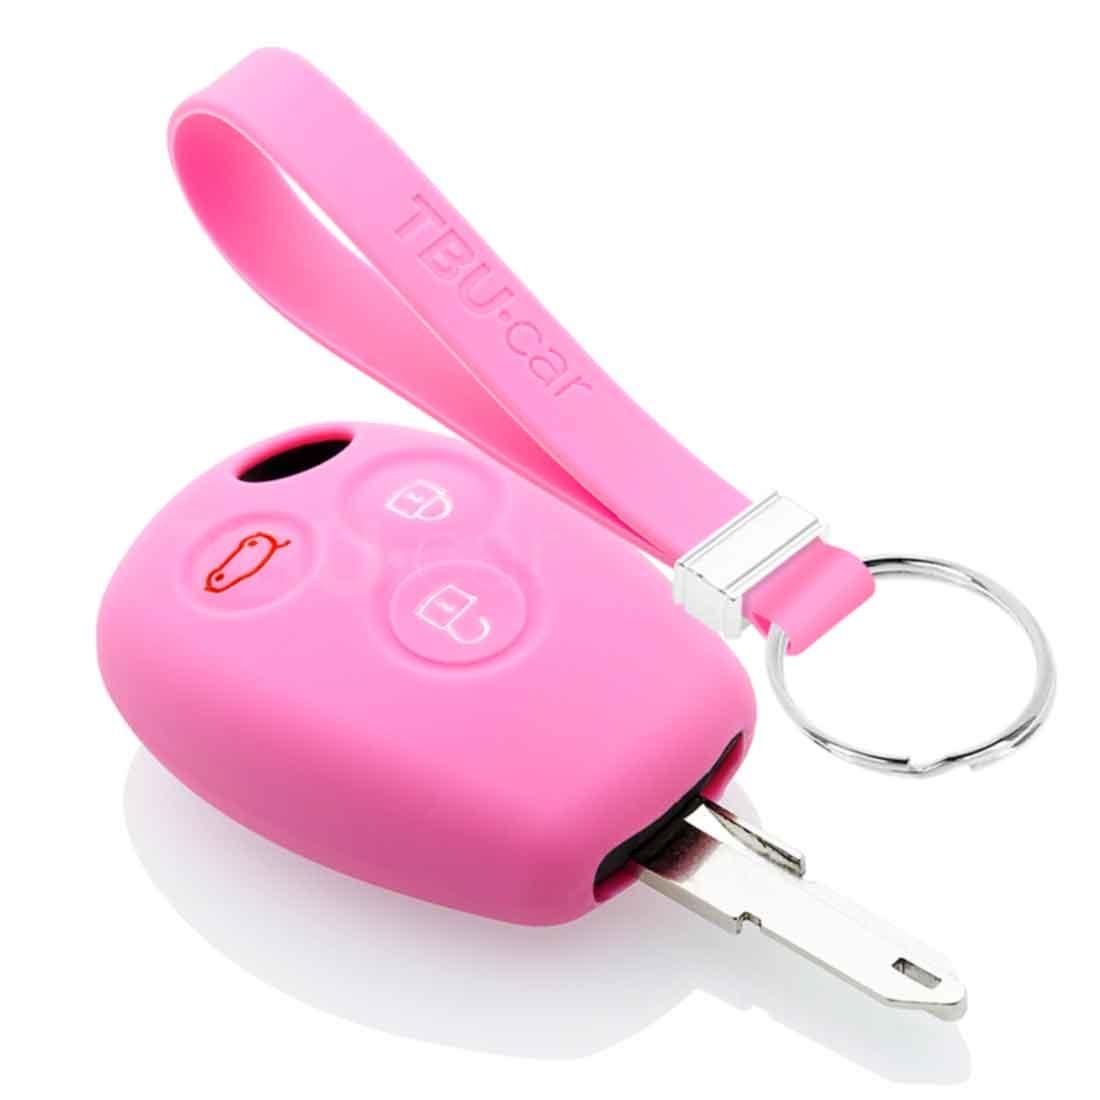 TBU car TBU car Sleutel cover compatibel met Smart - Silicone sleutelhoesje - beschermhoesje autosleutel - Roze